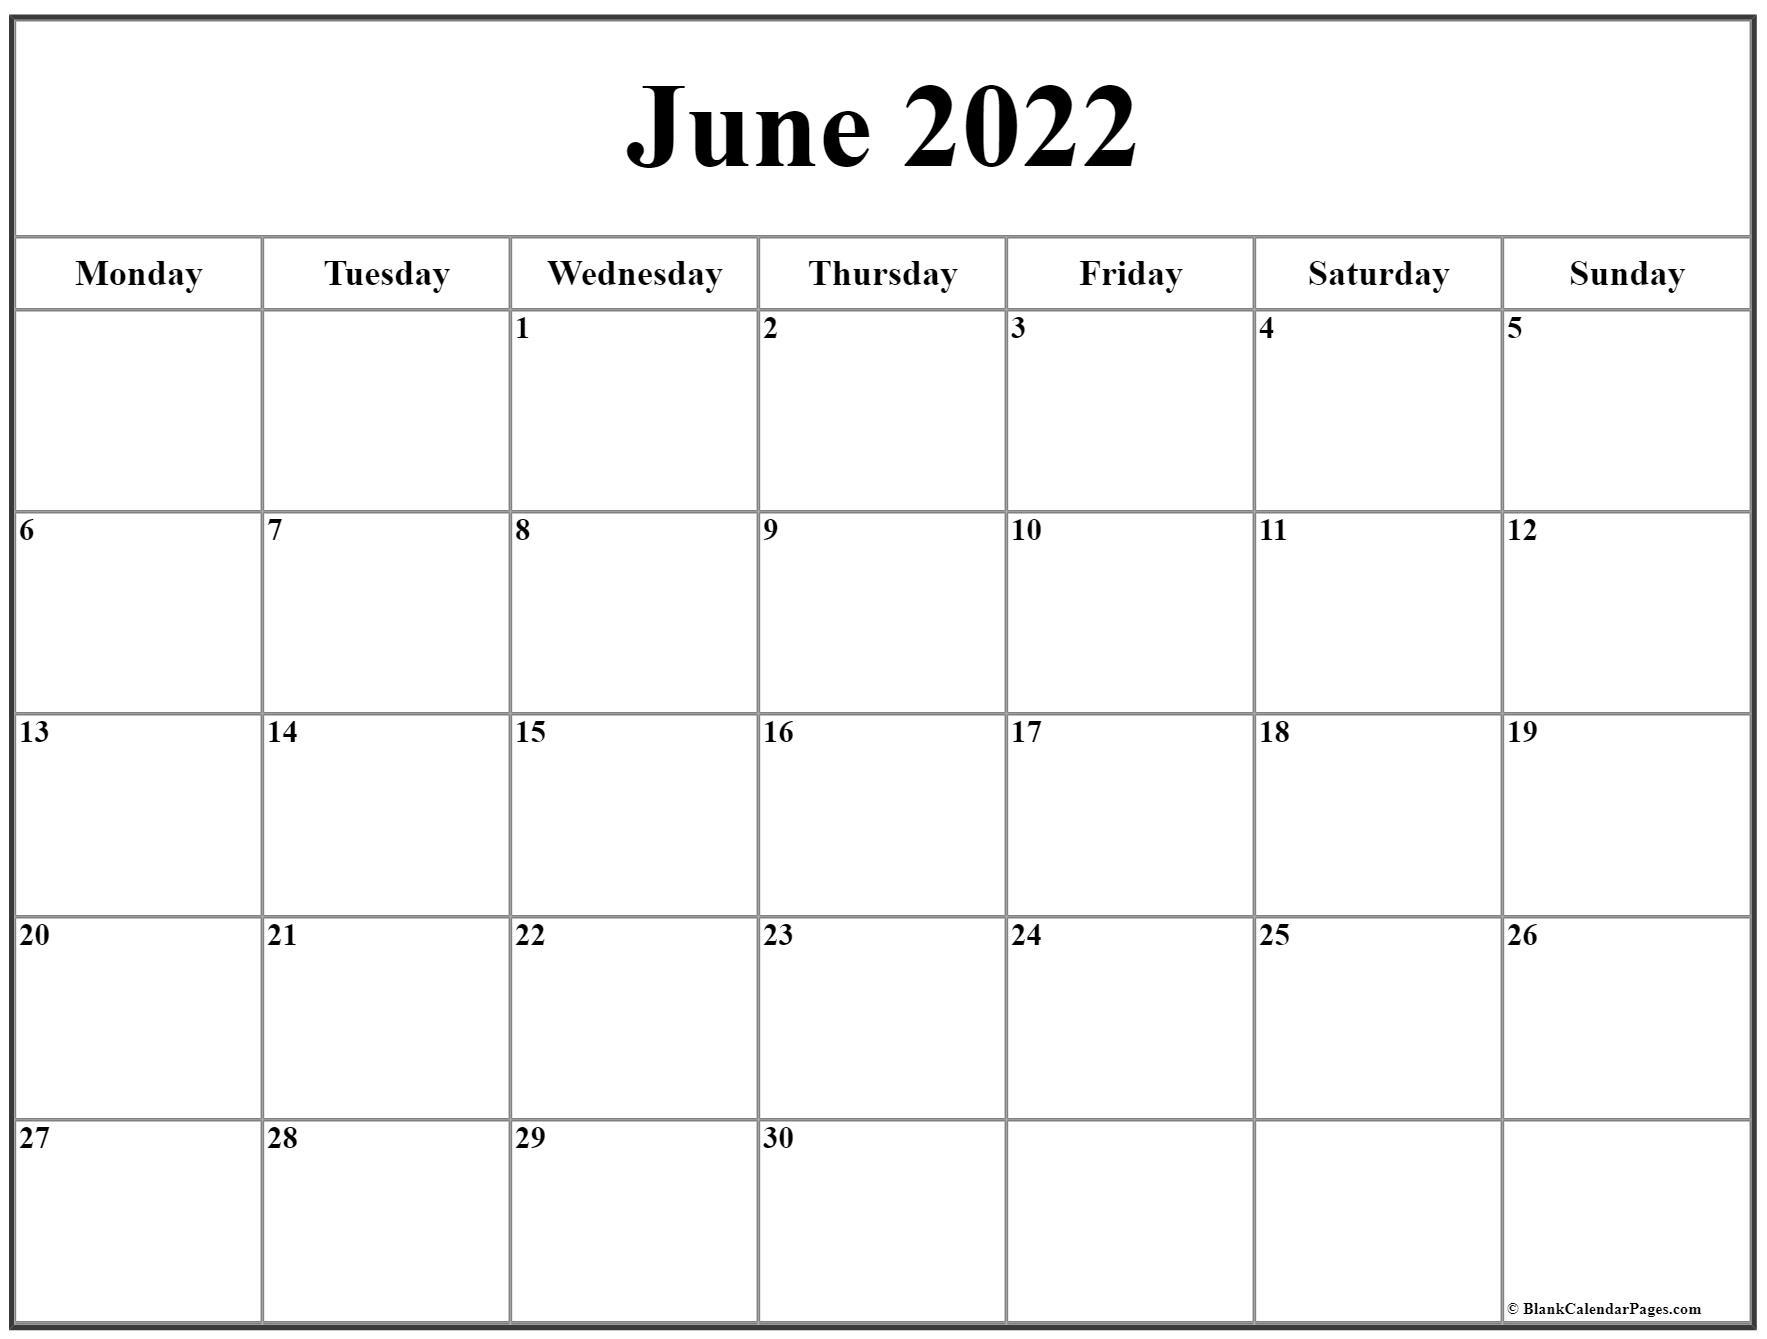 June 2022 Monday Calendar   Monday To Sunday